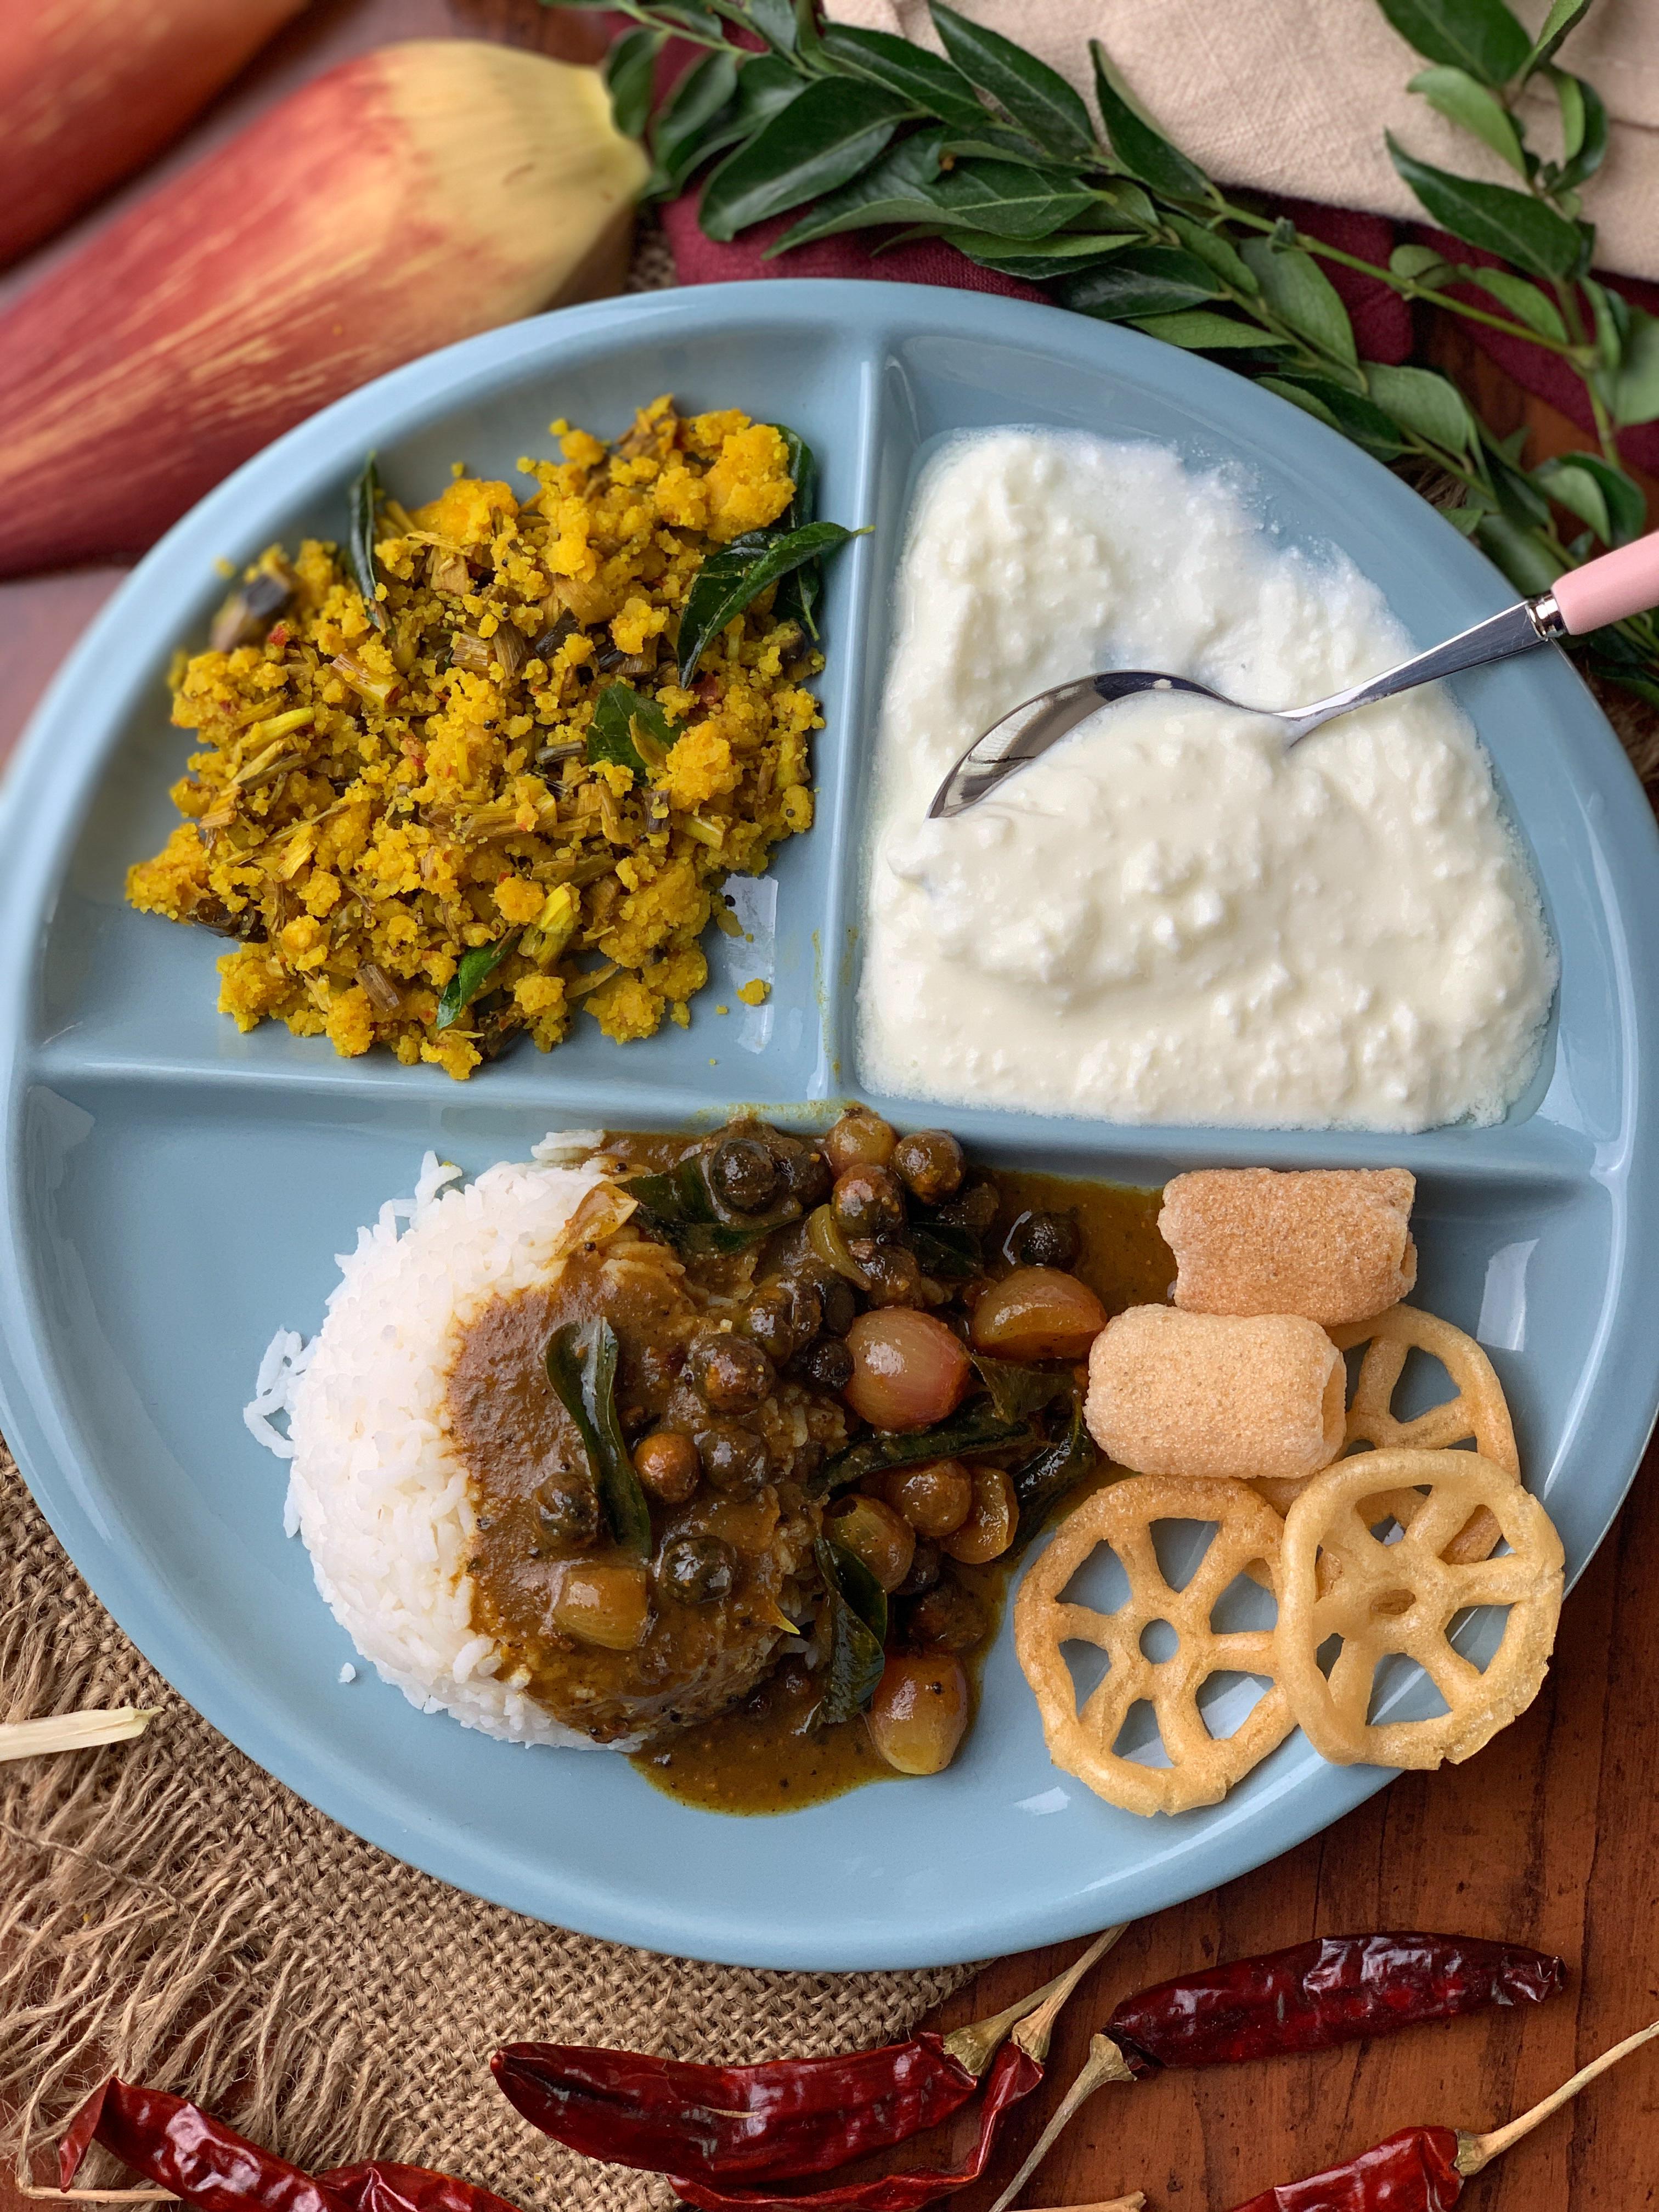 A Lunch From Grand Mother's Kitchen- Vathal Kuzhambu, Vazhaipoo Paruppu Usili & More